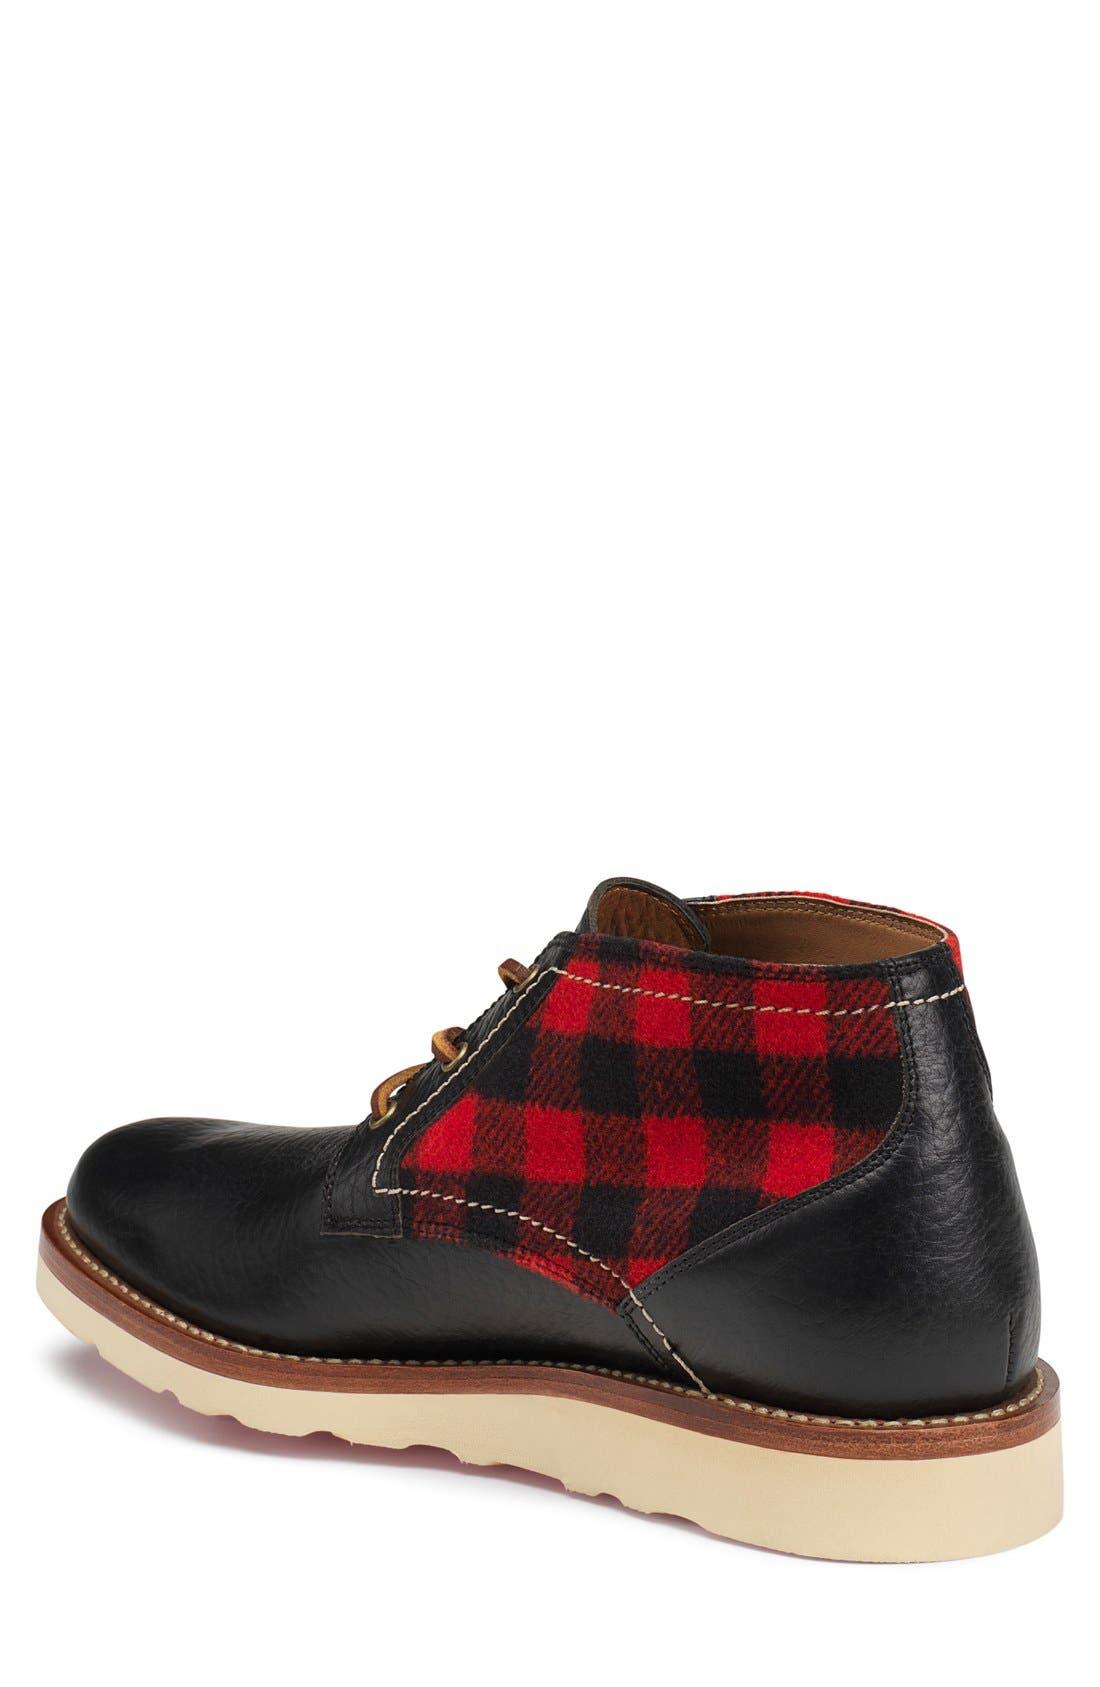 'Bighorn' Plain Toe Boot,                             Alternate thumbnail 5, color,